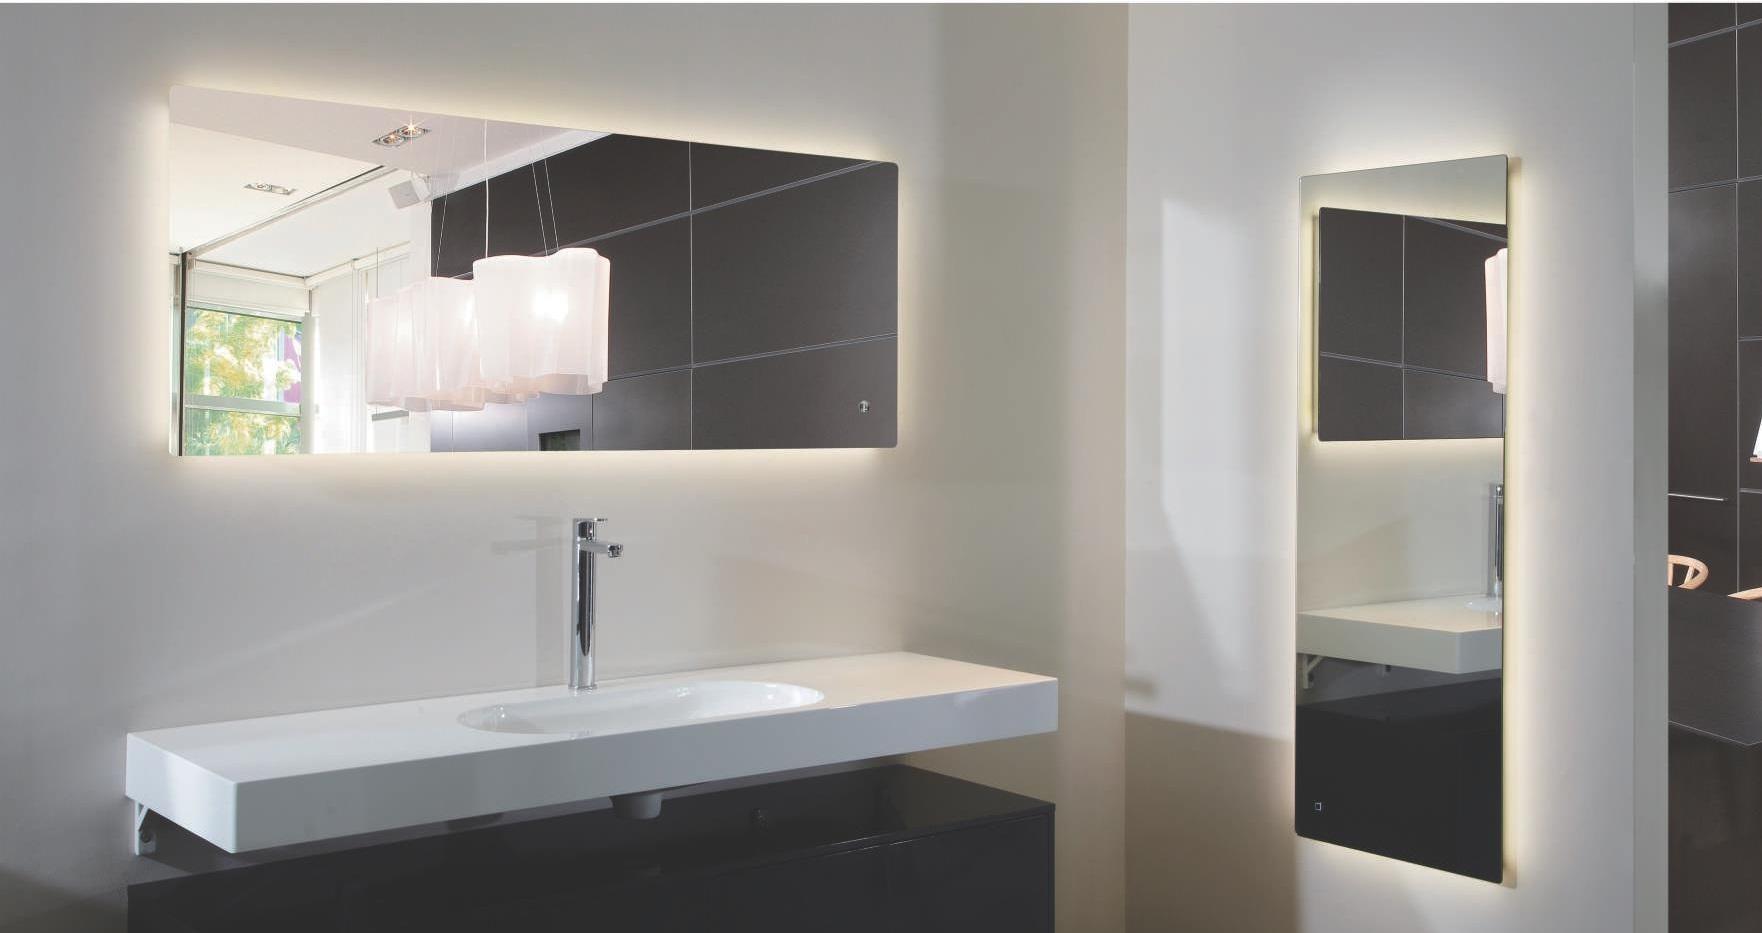 Afina Illume Led Backlit Rectangular Bathroom Mirror Of With Back With Regard To Led Illuminated Bathroom Mirrors (View 9 of 20)